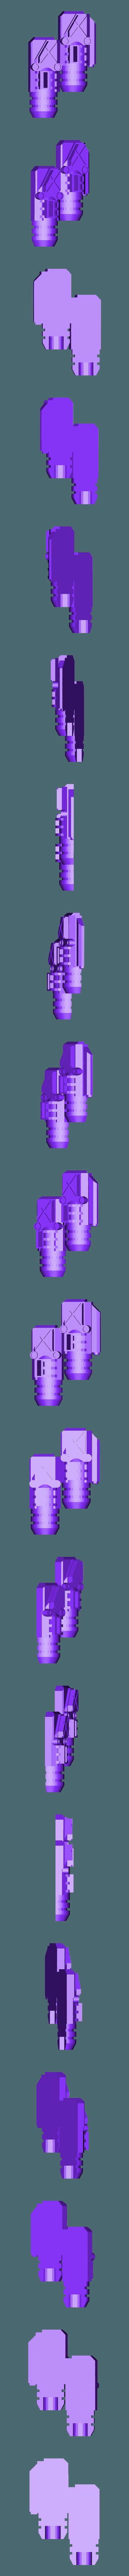 Gun_Left_Top.stl Download free STL file Interstellar Army - Quad Mortar and Quad Cannon • 3D printing model, Cikkirock